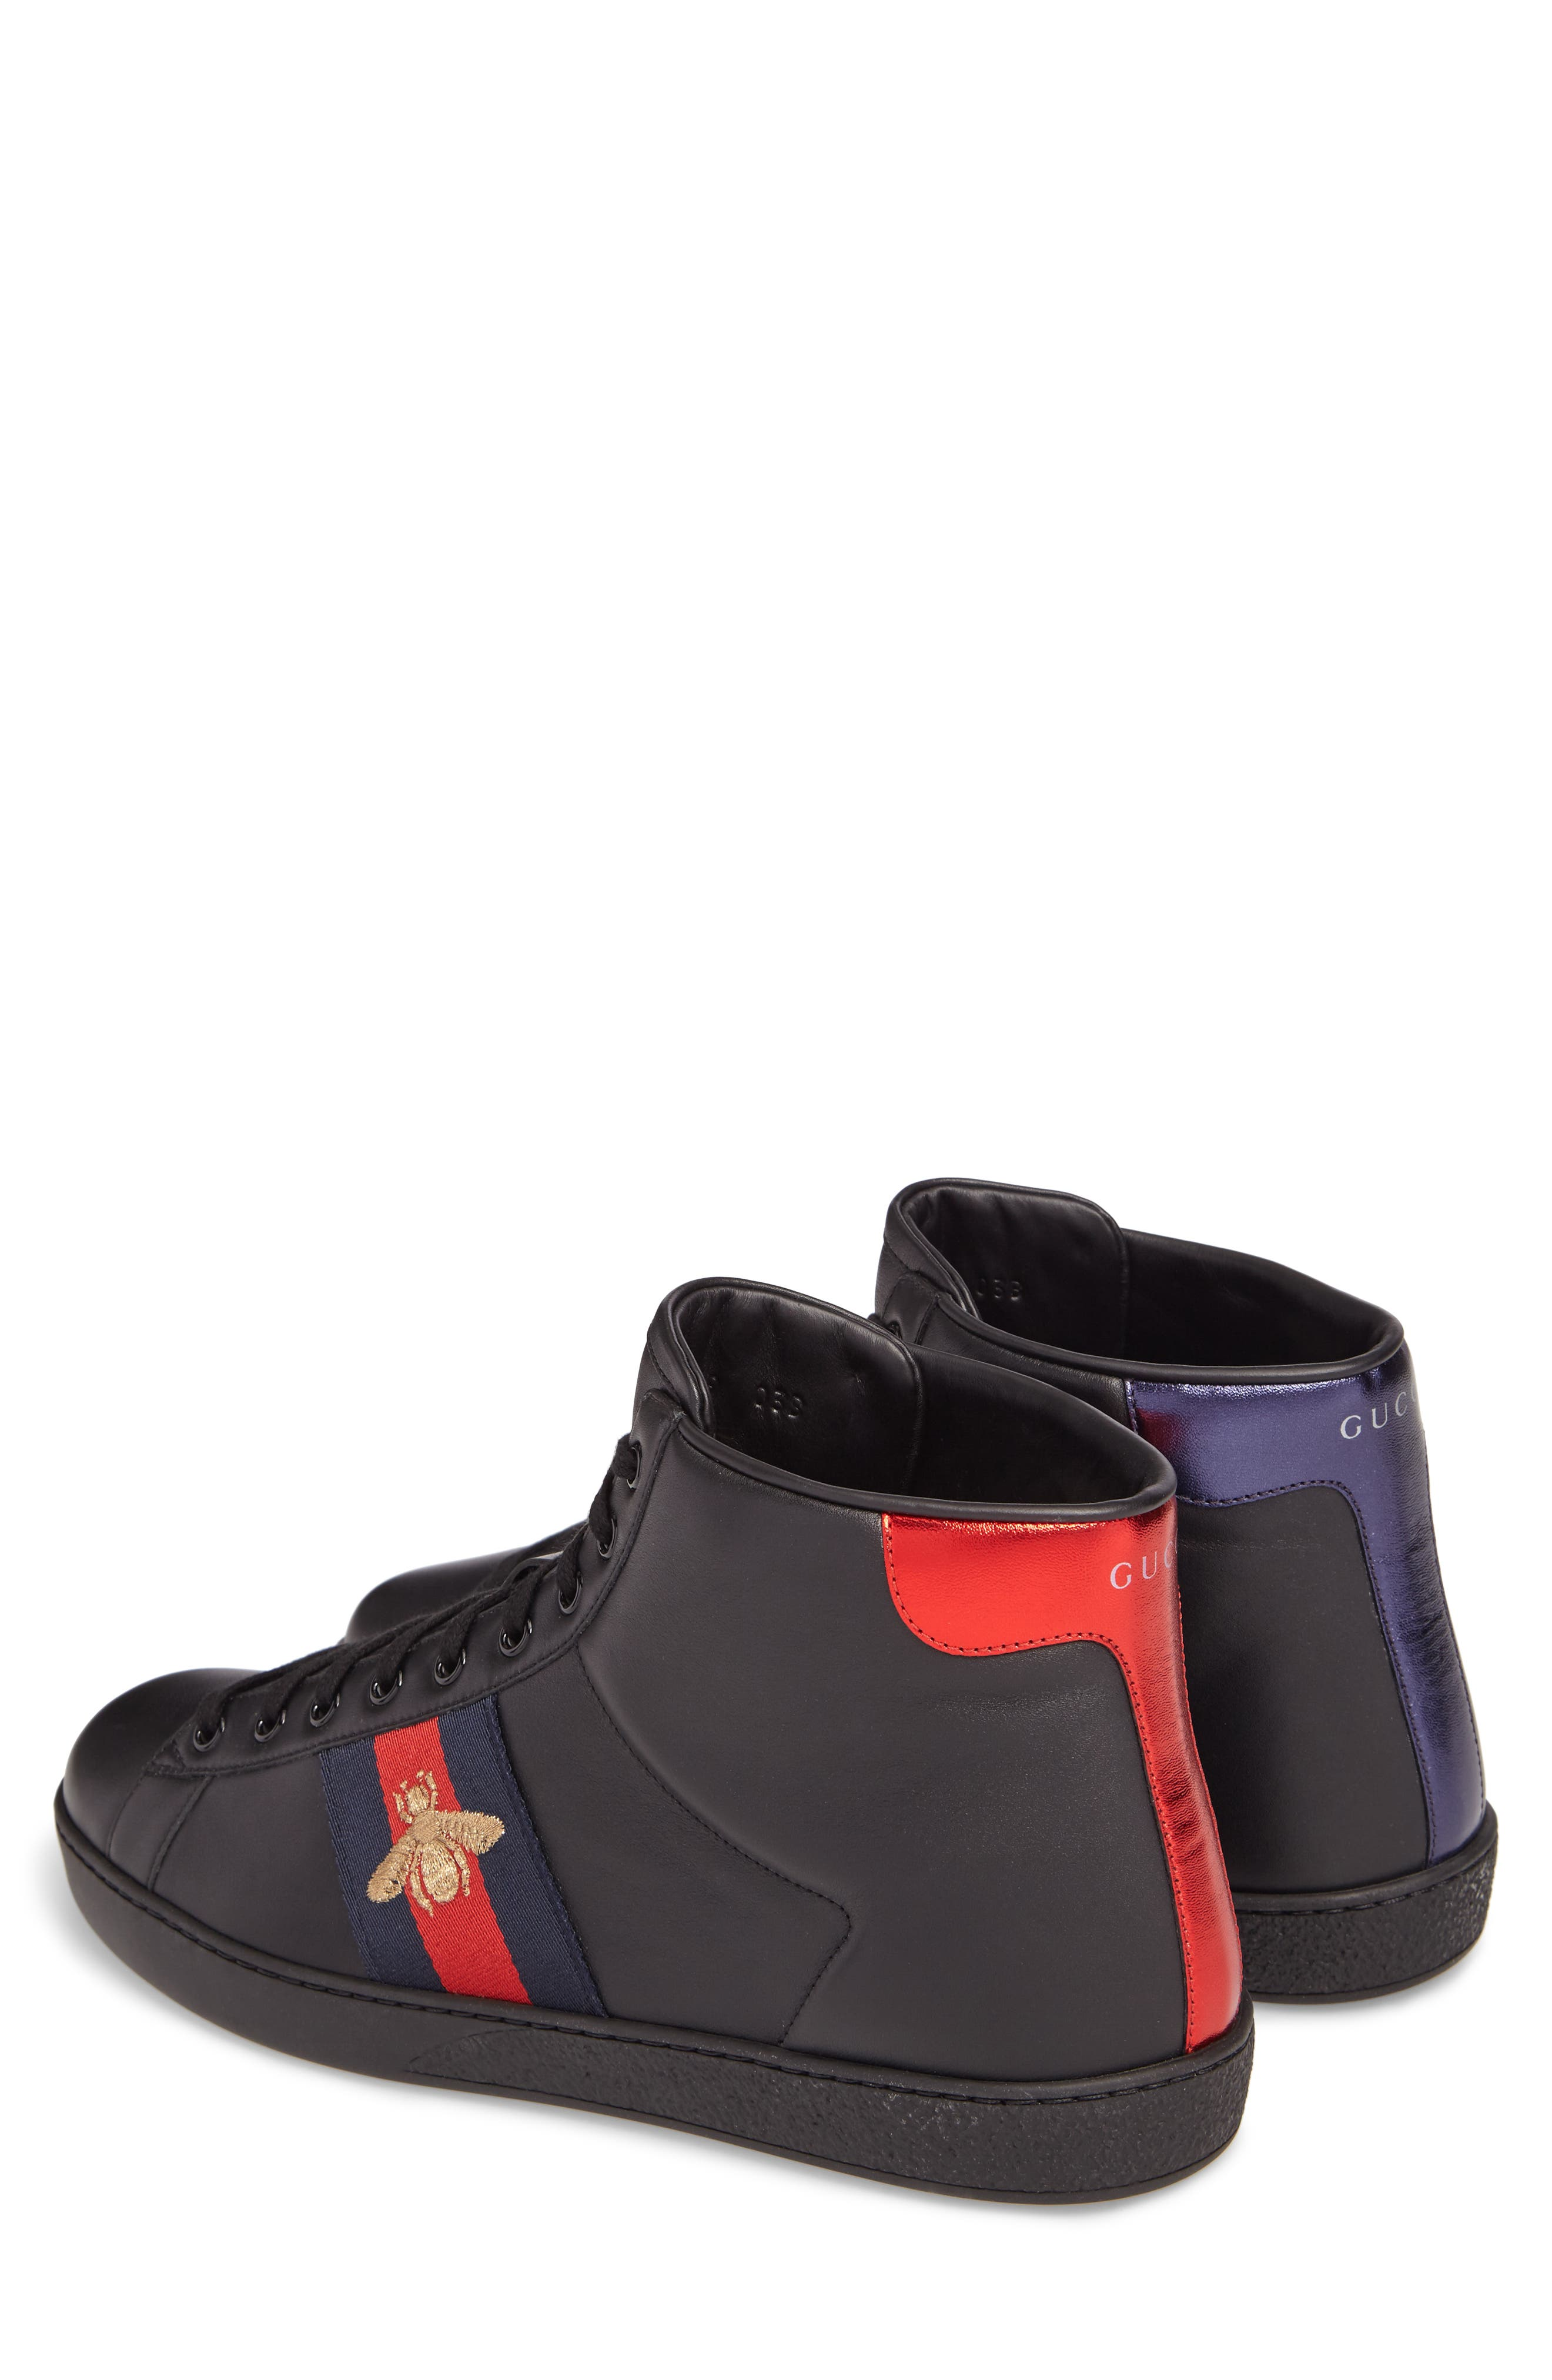 Ace High Top Sneaker,                             Alternate thumbnail 2, color,                             Black